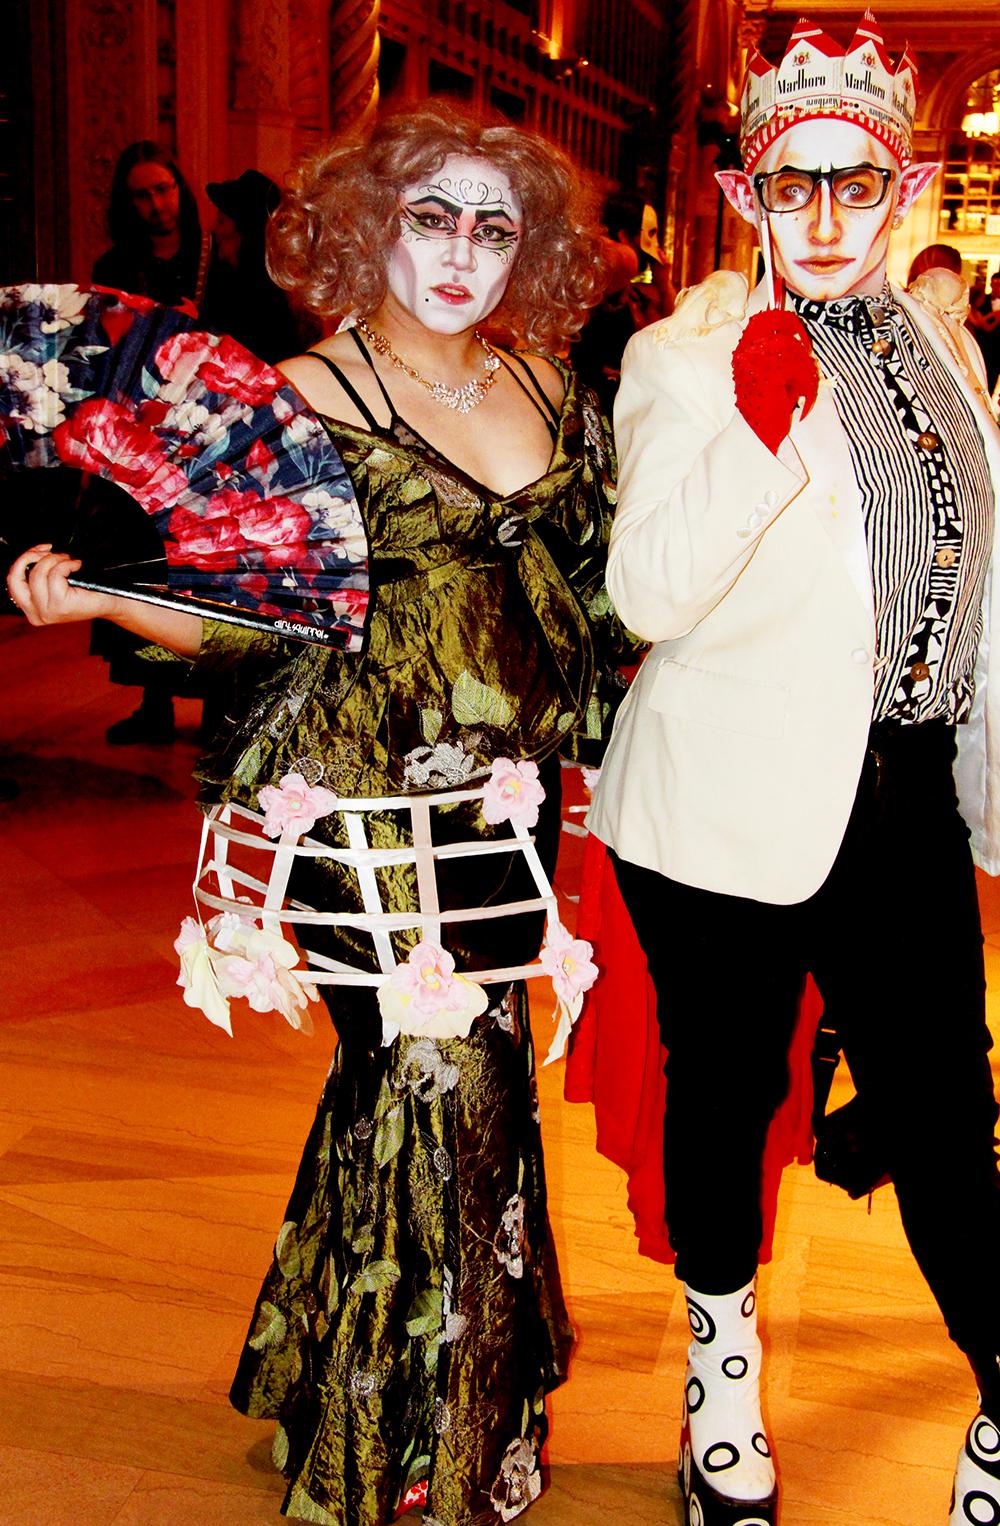 labyrinthmasquerade2019_0022